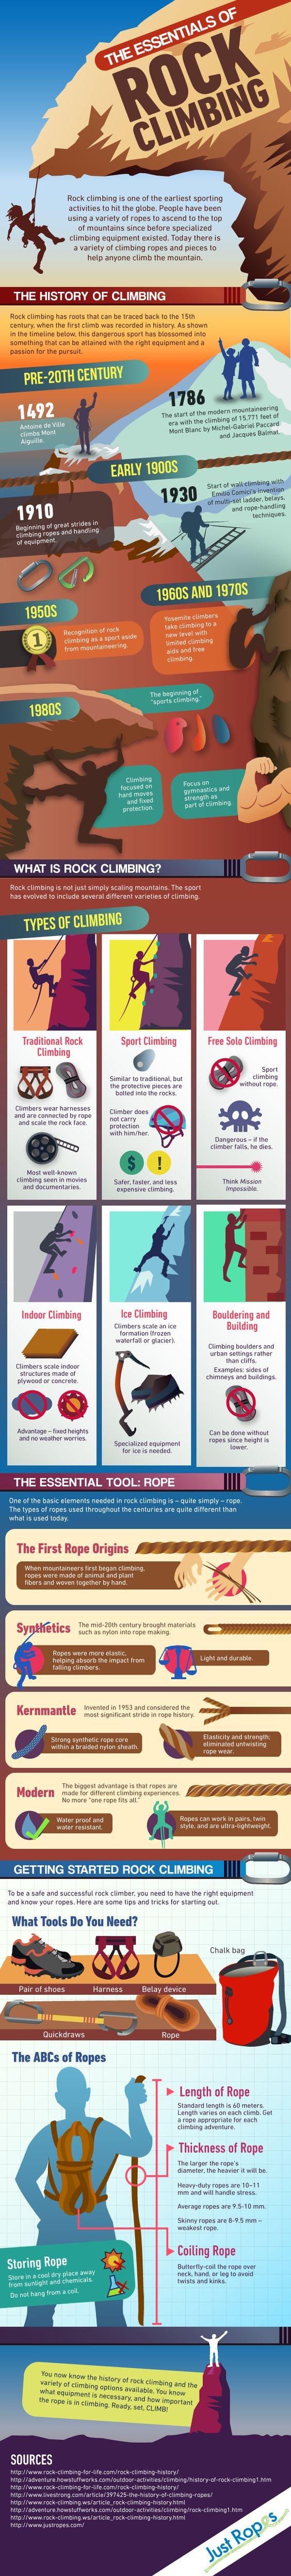 rock-climbing-history